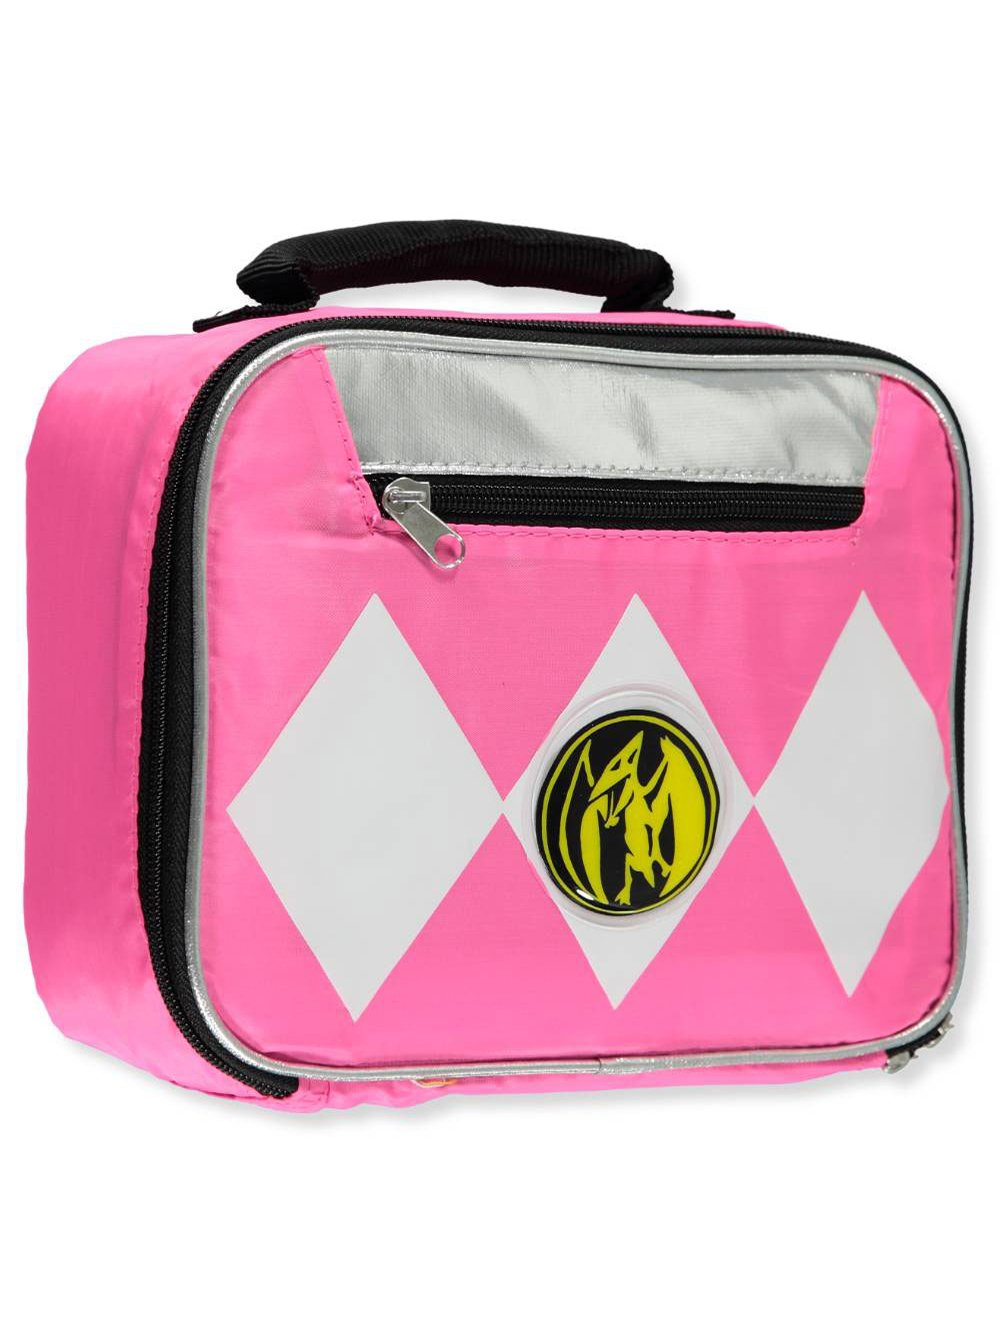 Saban's Power Rangers Pink Ranger Insulated Lunch Box